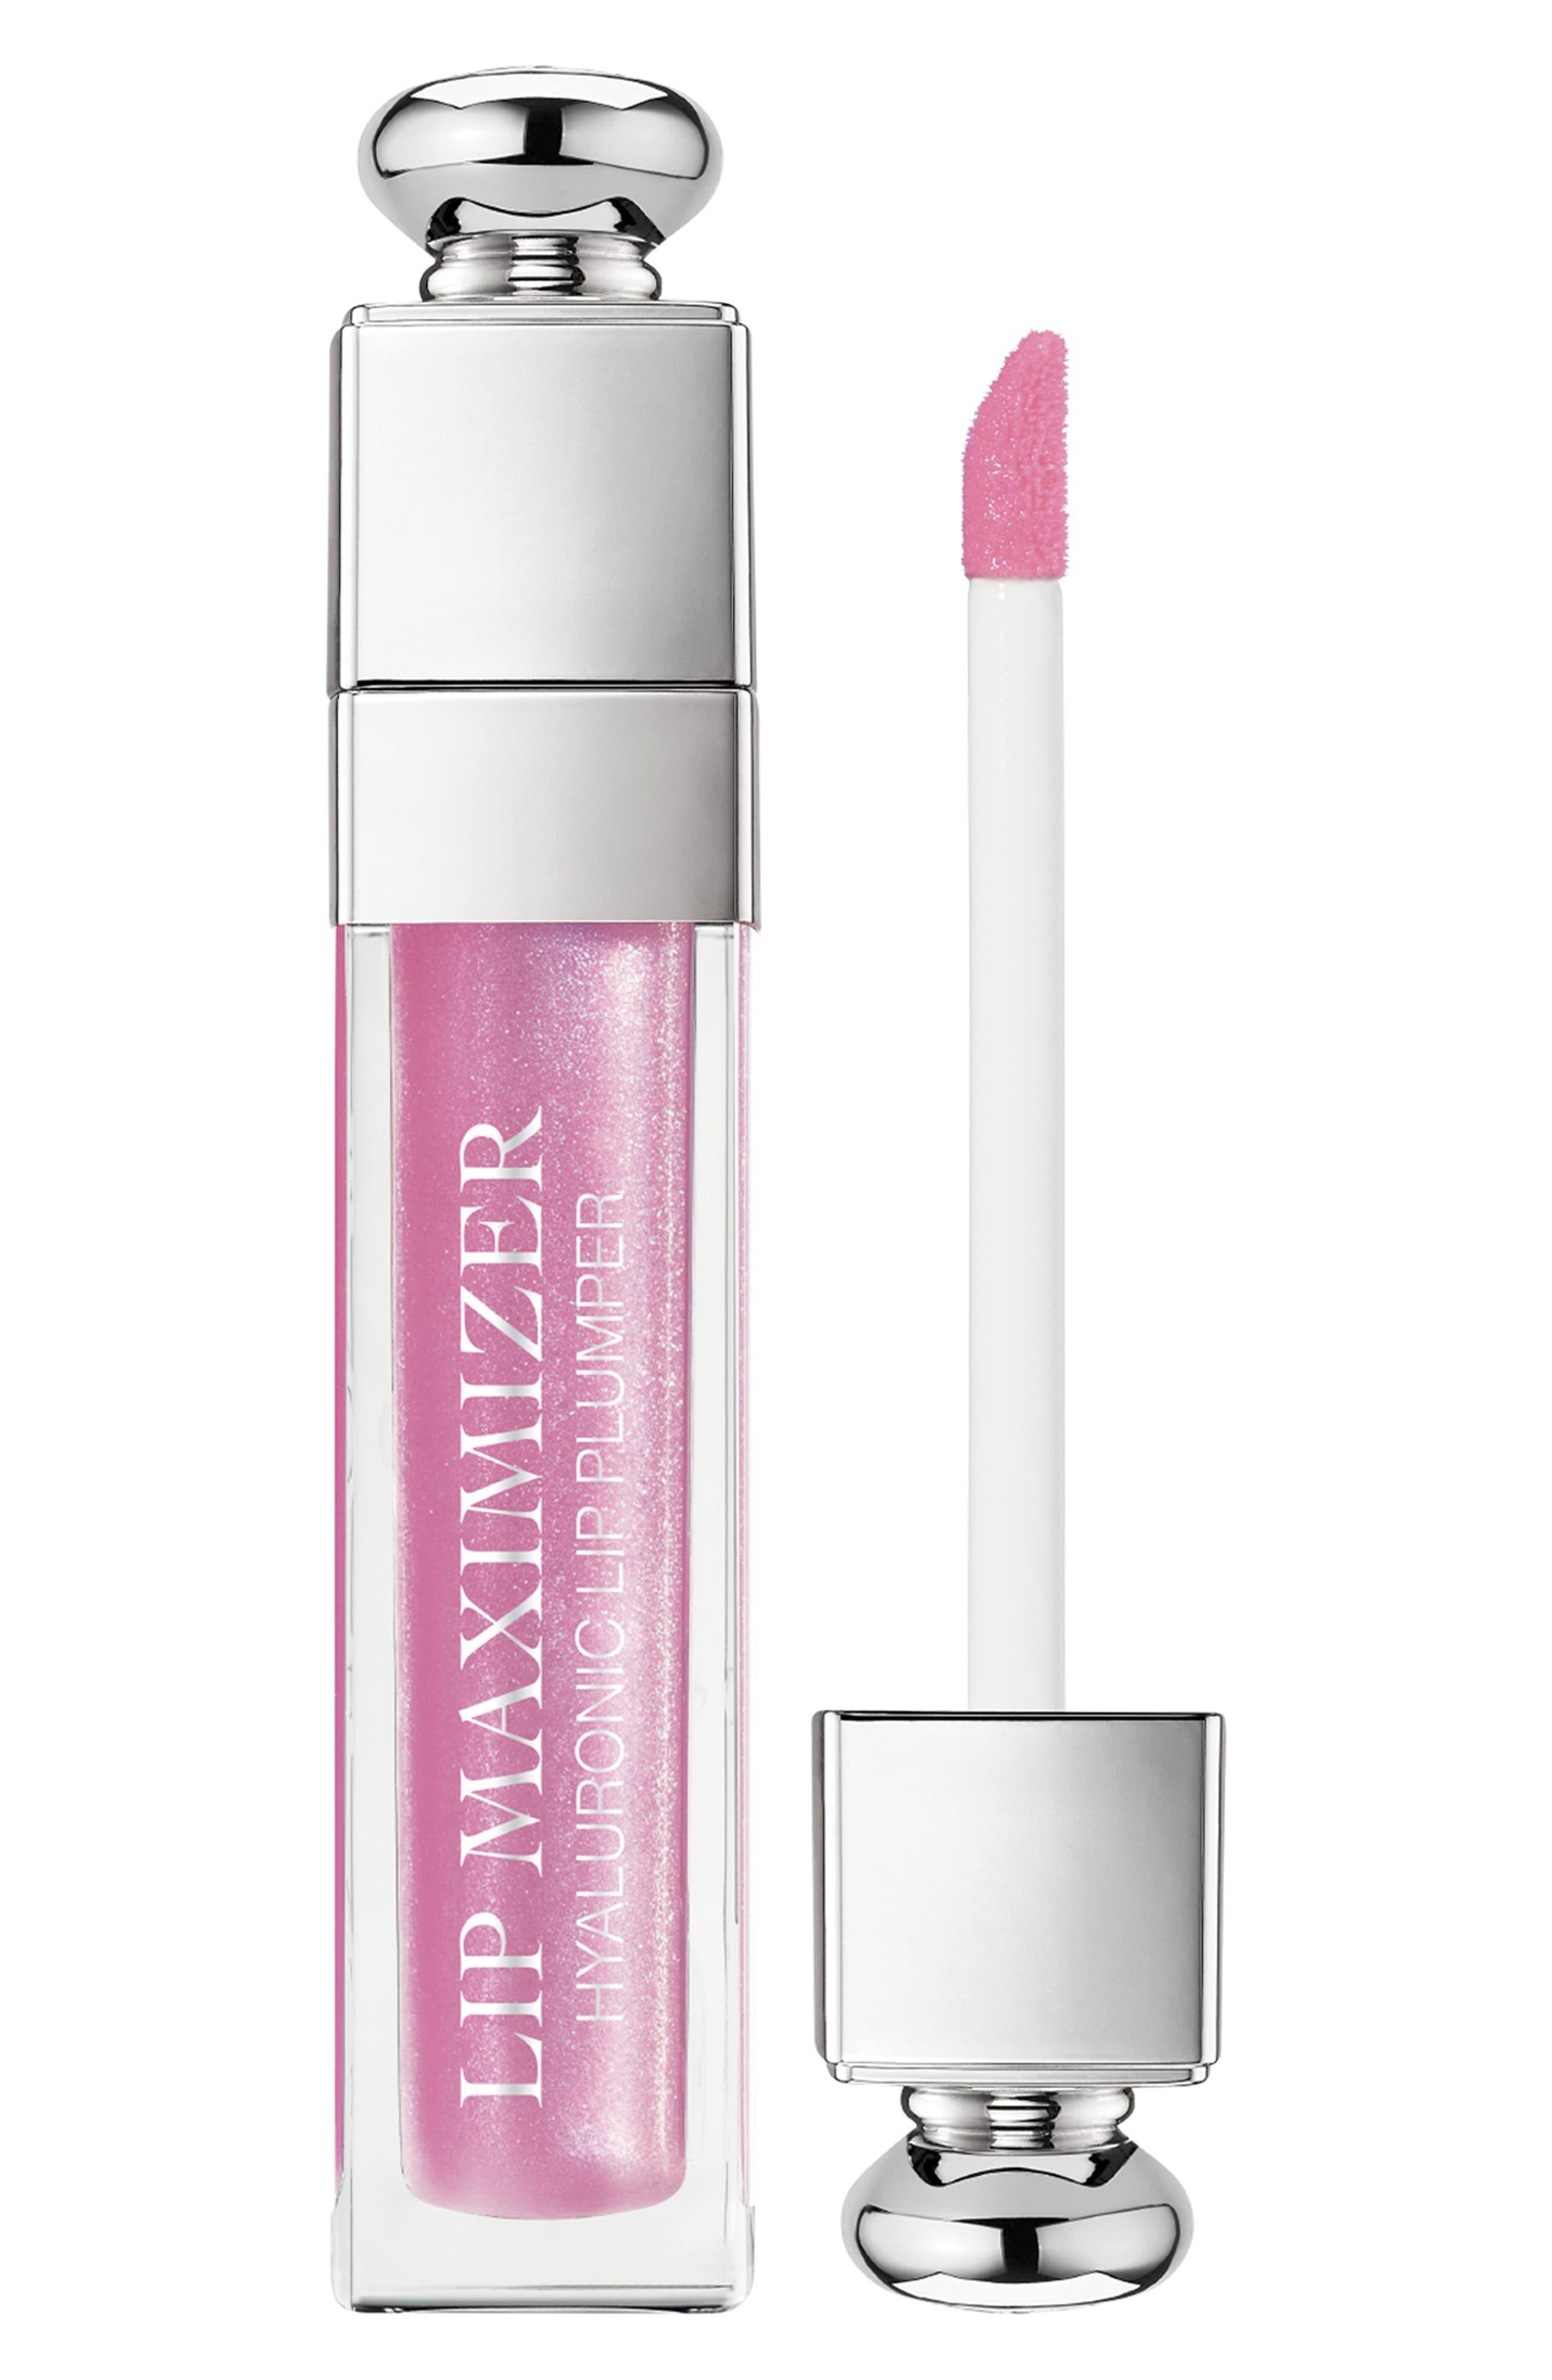 Dior Addict Lip Maximizer - 009 Purple/ Holographic